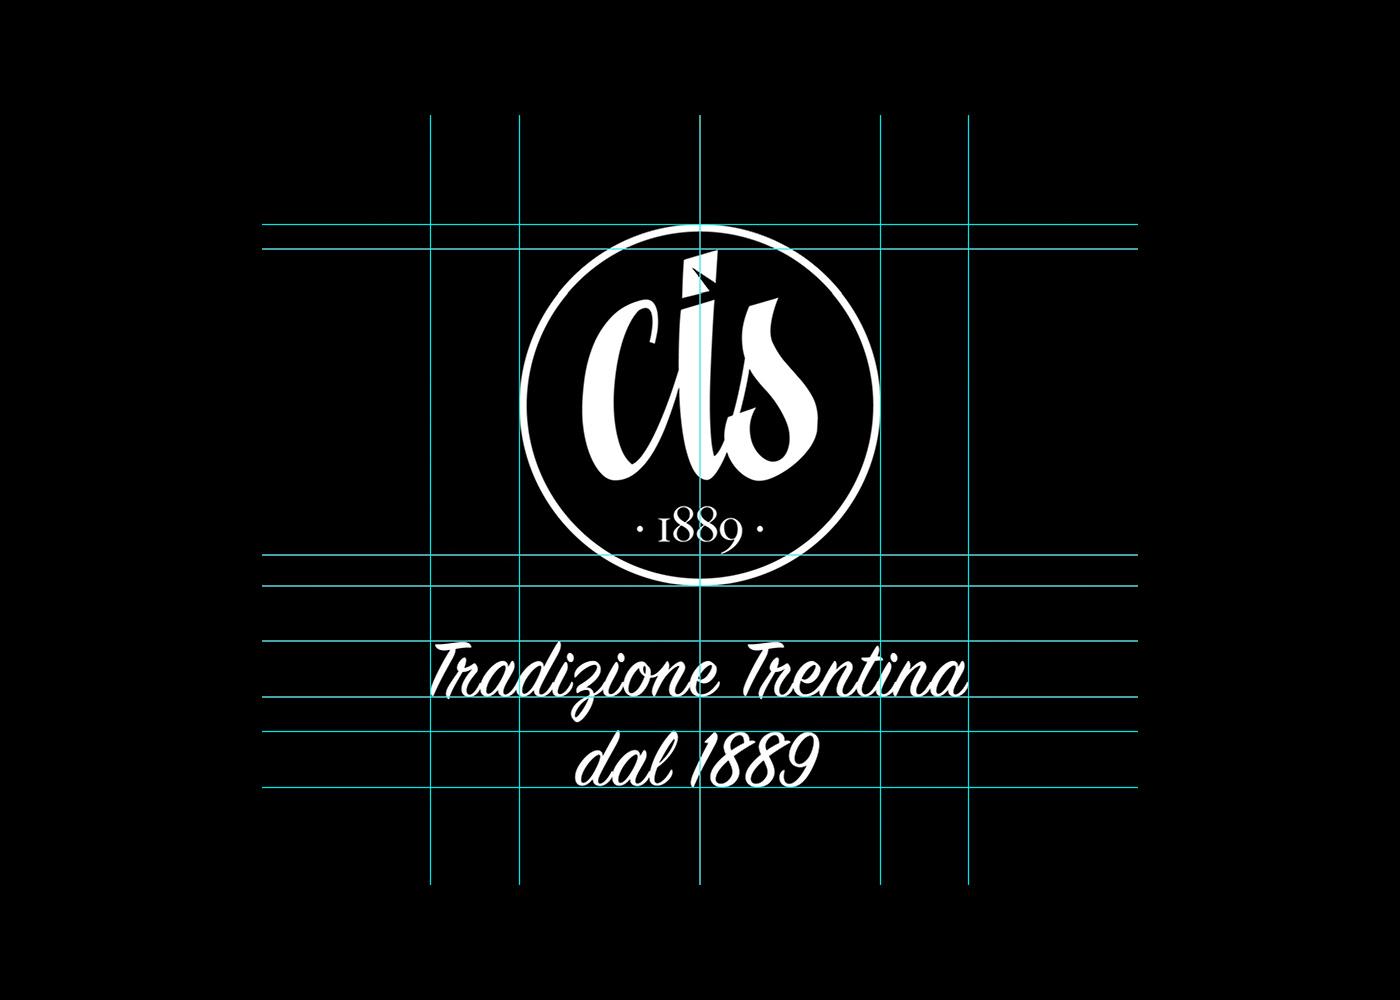 04 Macelleria cis logotipo grafico milano